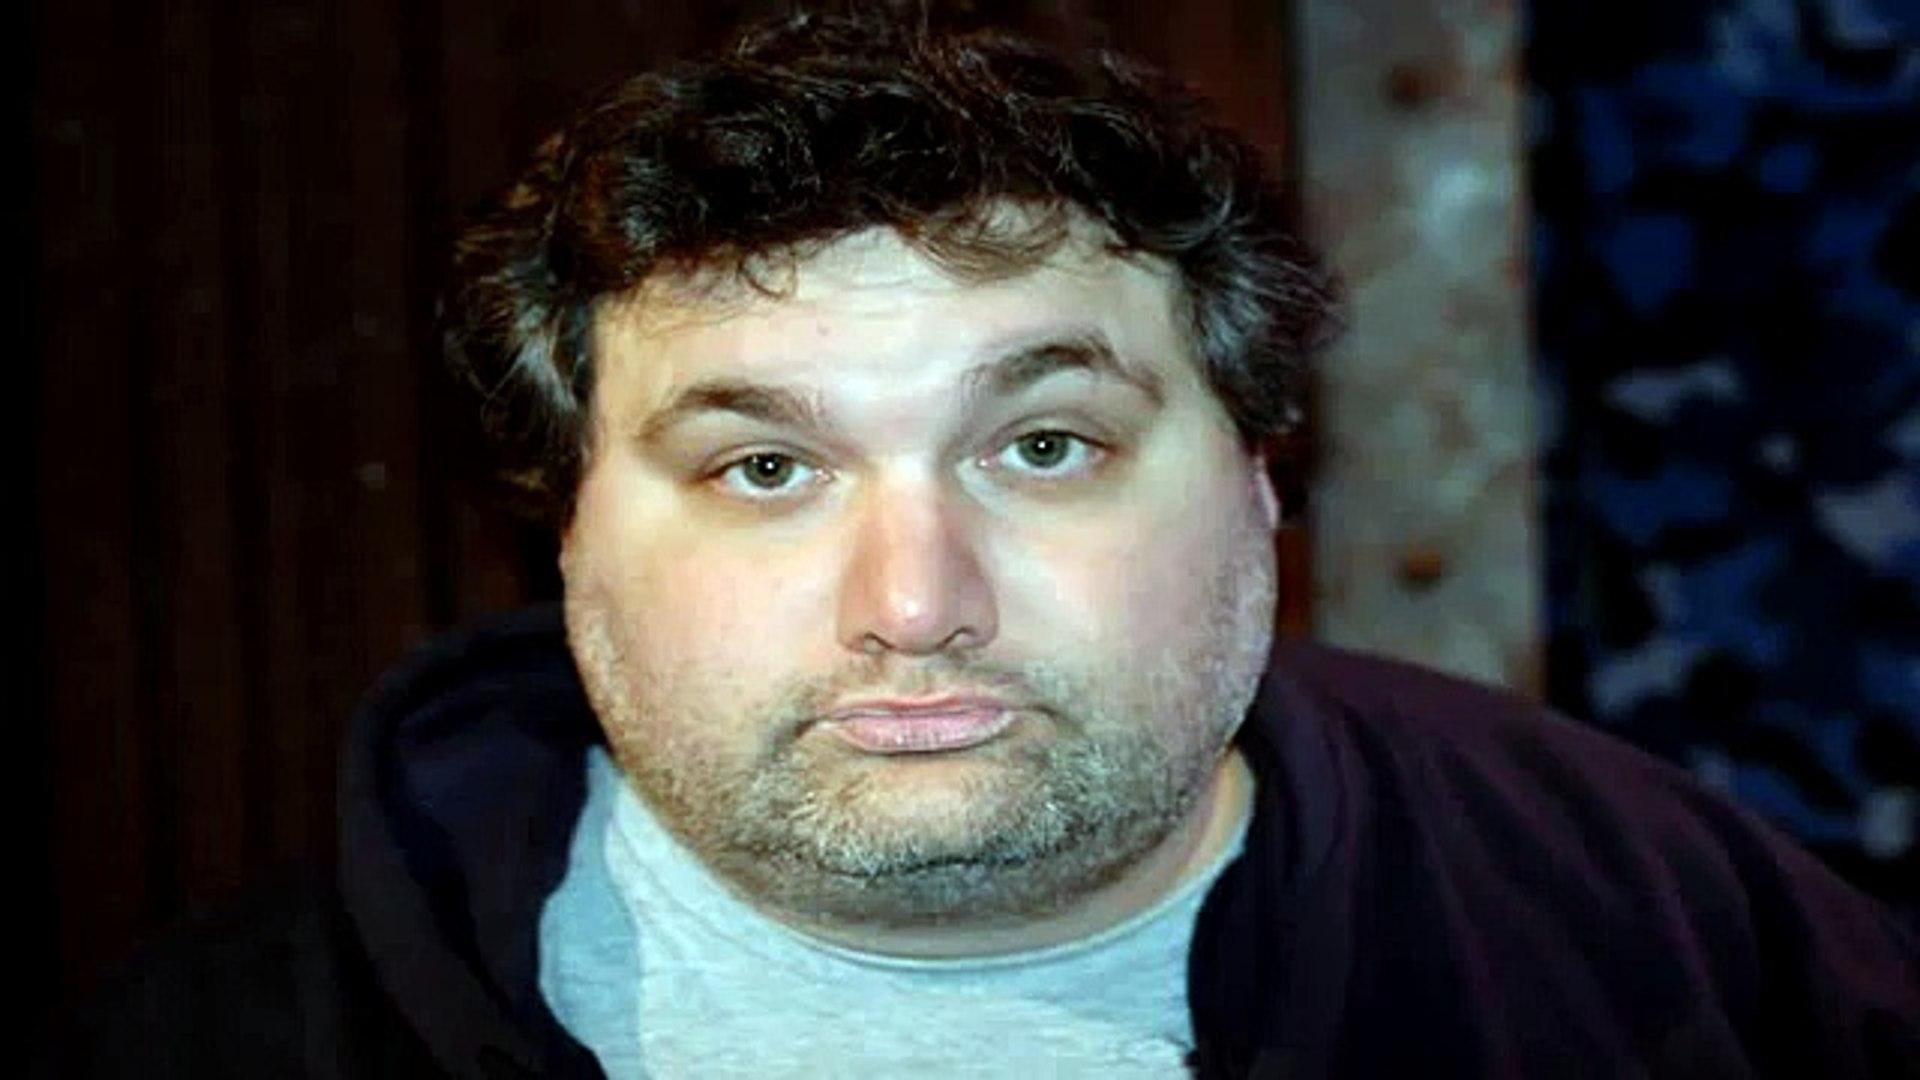 Fat-Ass Vinnie Favale Ruins Artie's Life, Grandma Caprio Makes It Worse 1/4  (1/30/2008)